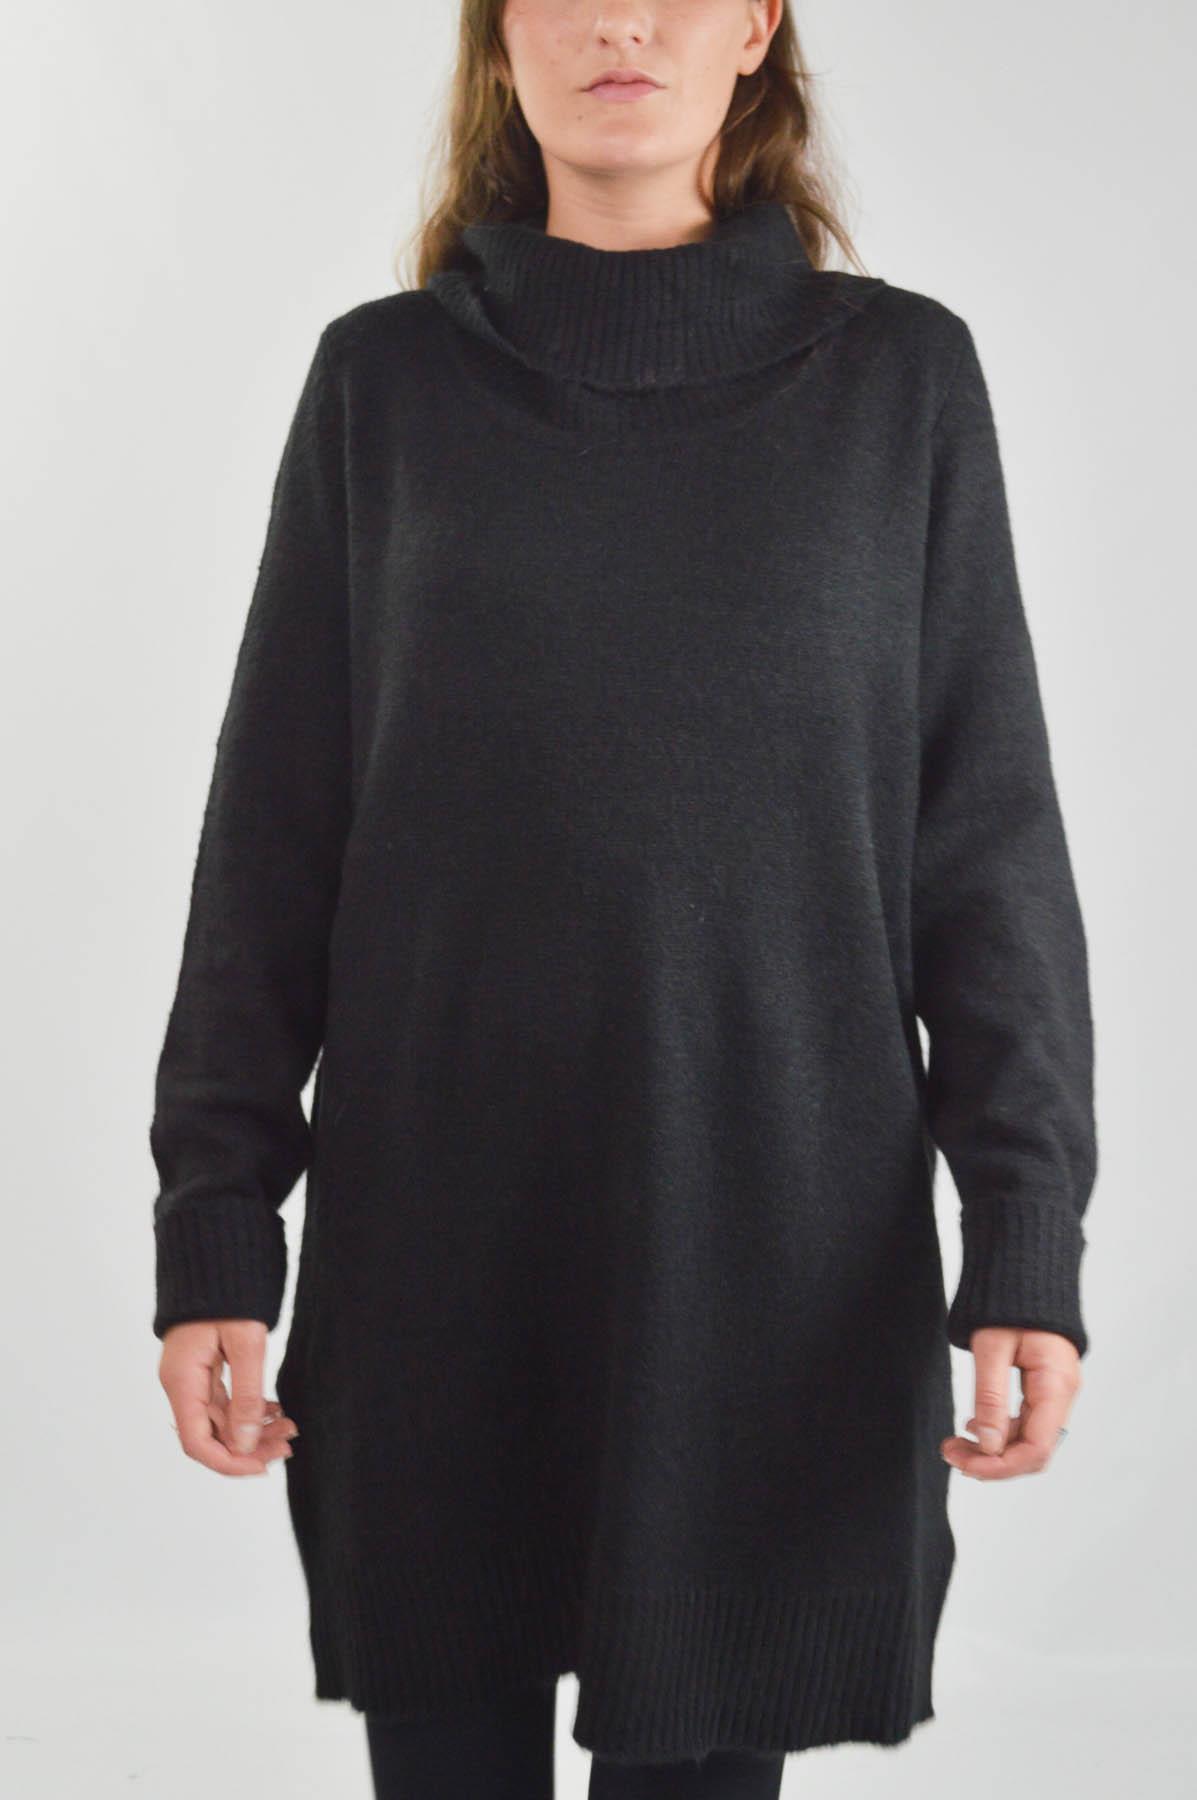 RRP £35 Women`s New Esprit Cowl Neck Jumper Dress UK Sizes 6-8-10-12-14-16